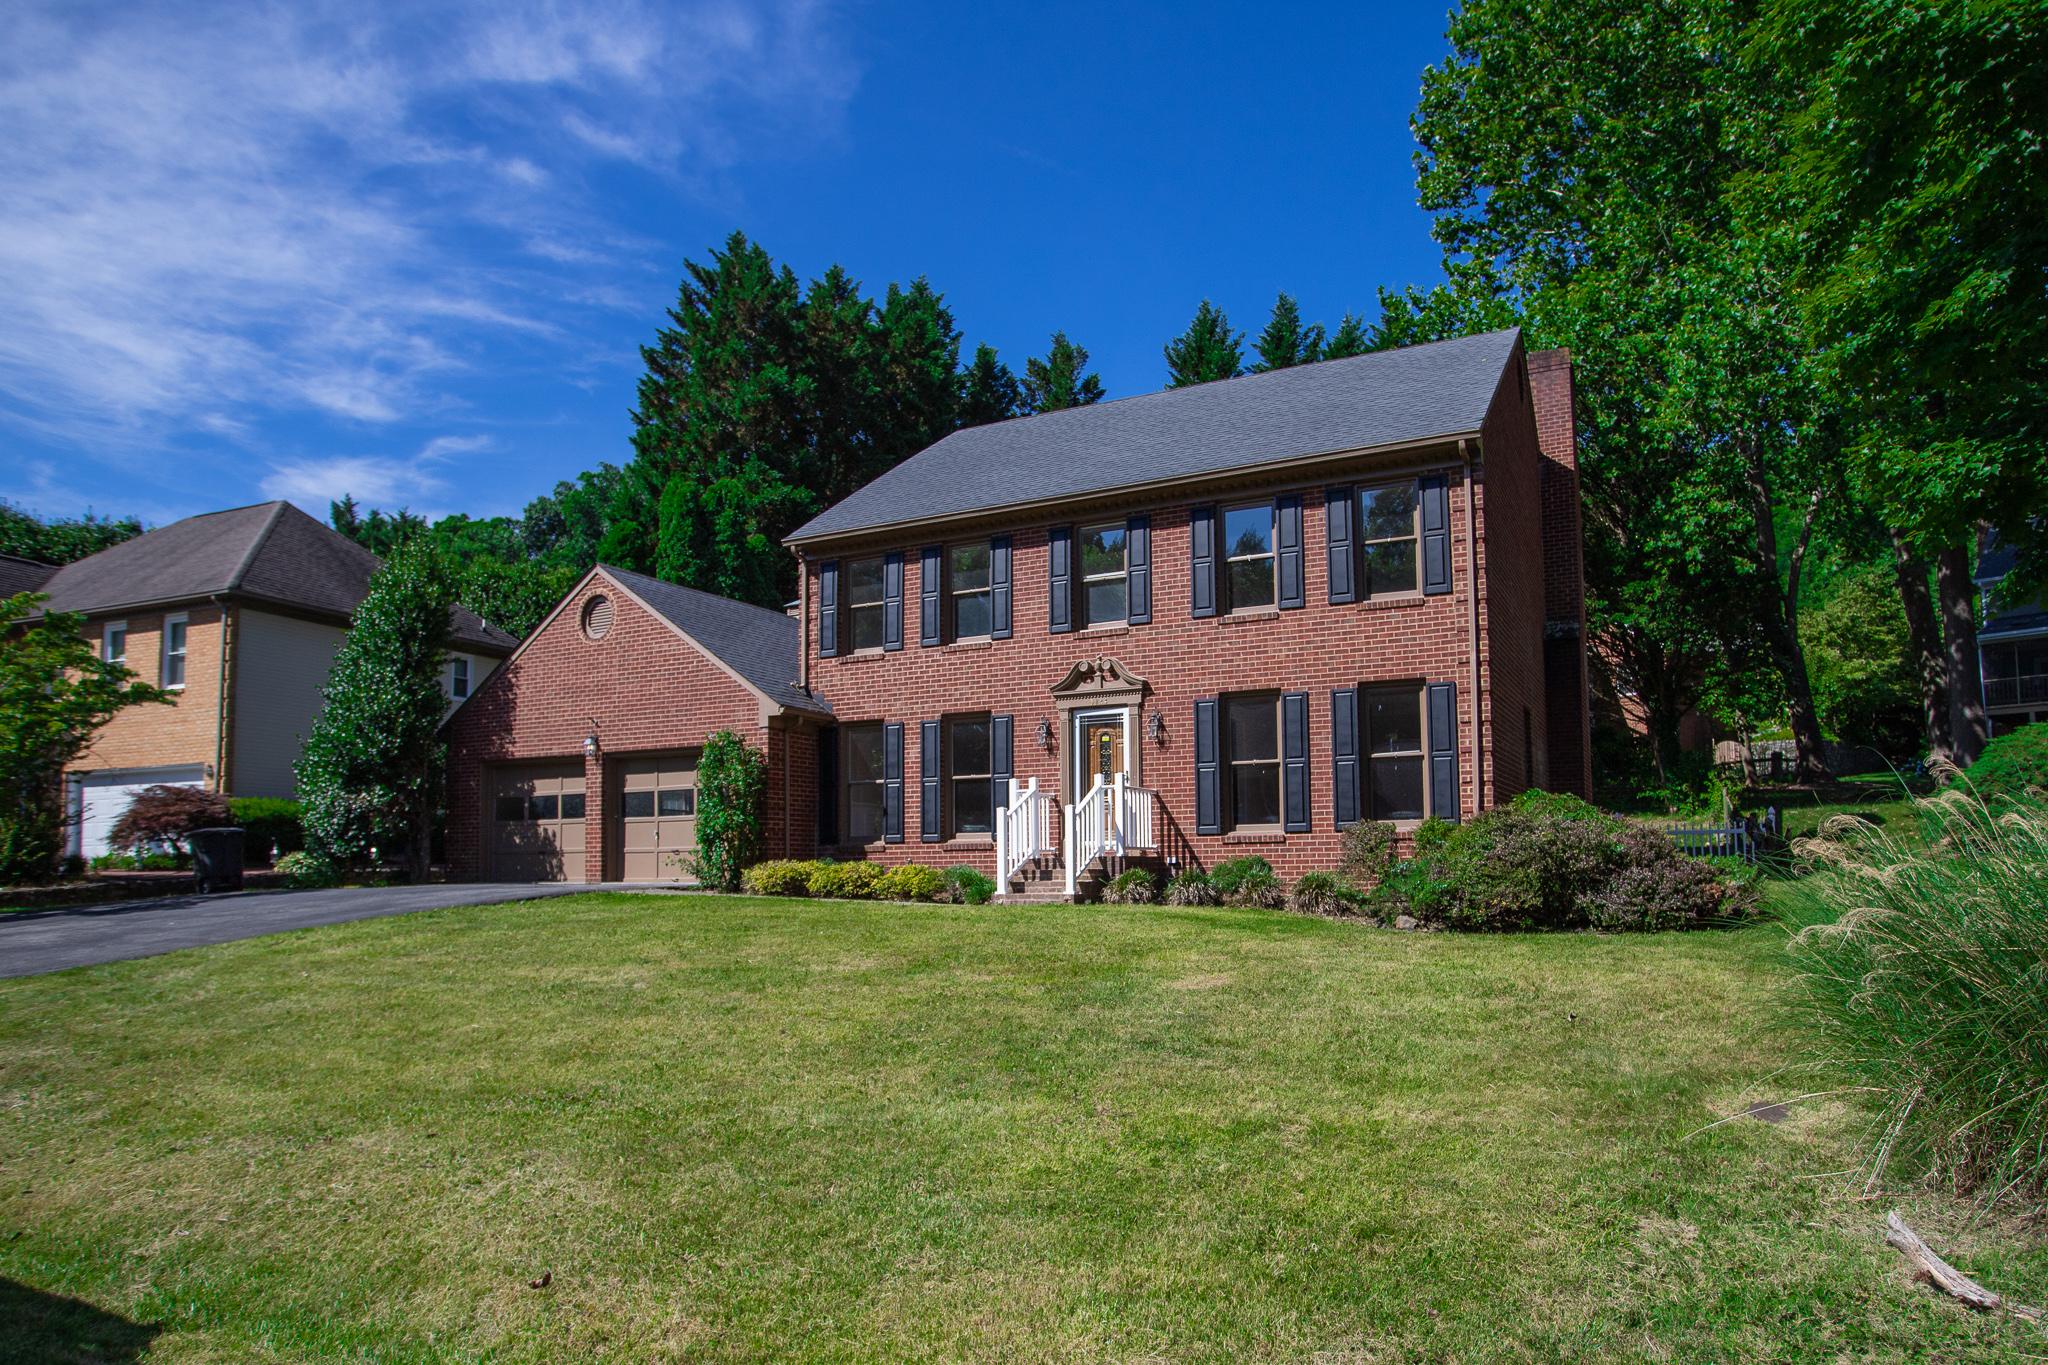 Beautiful Brick Home in Roanoke, 5124 Meadow Creek Drive